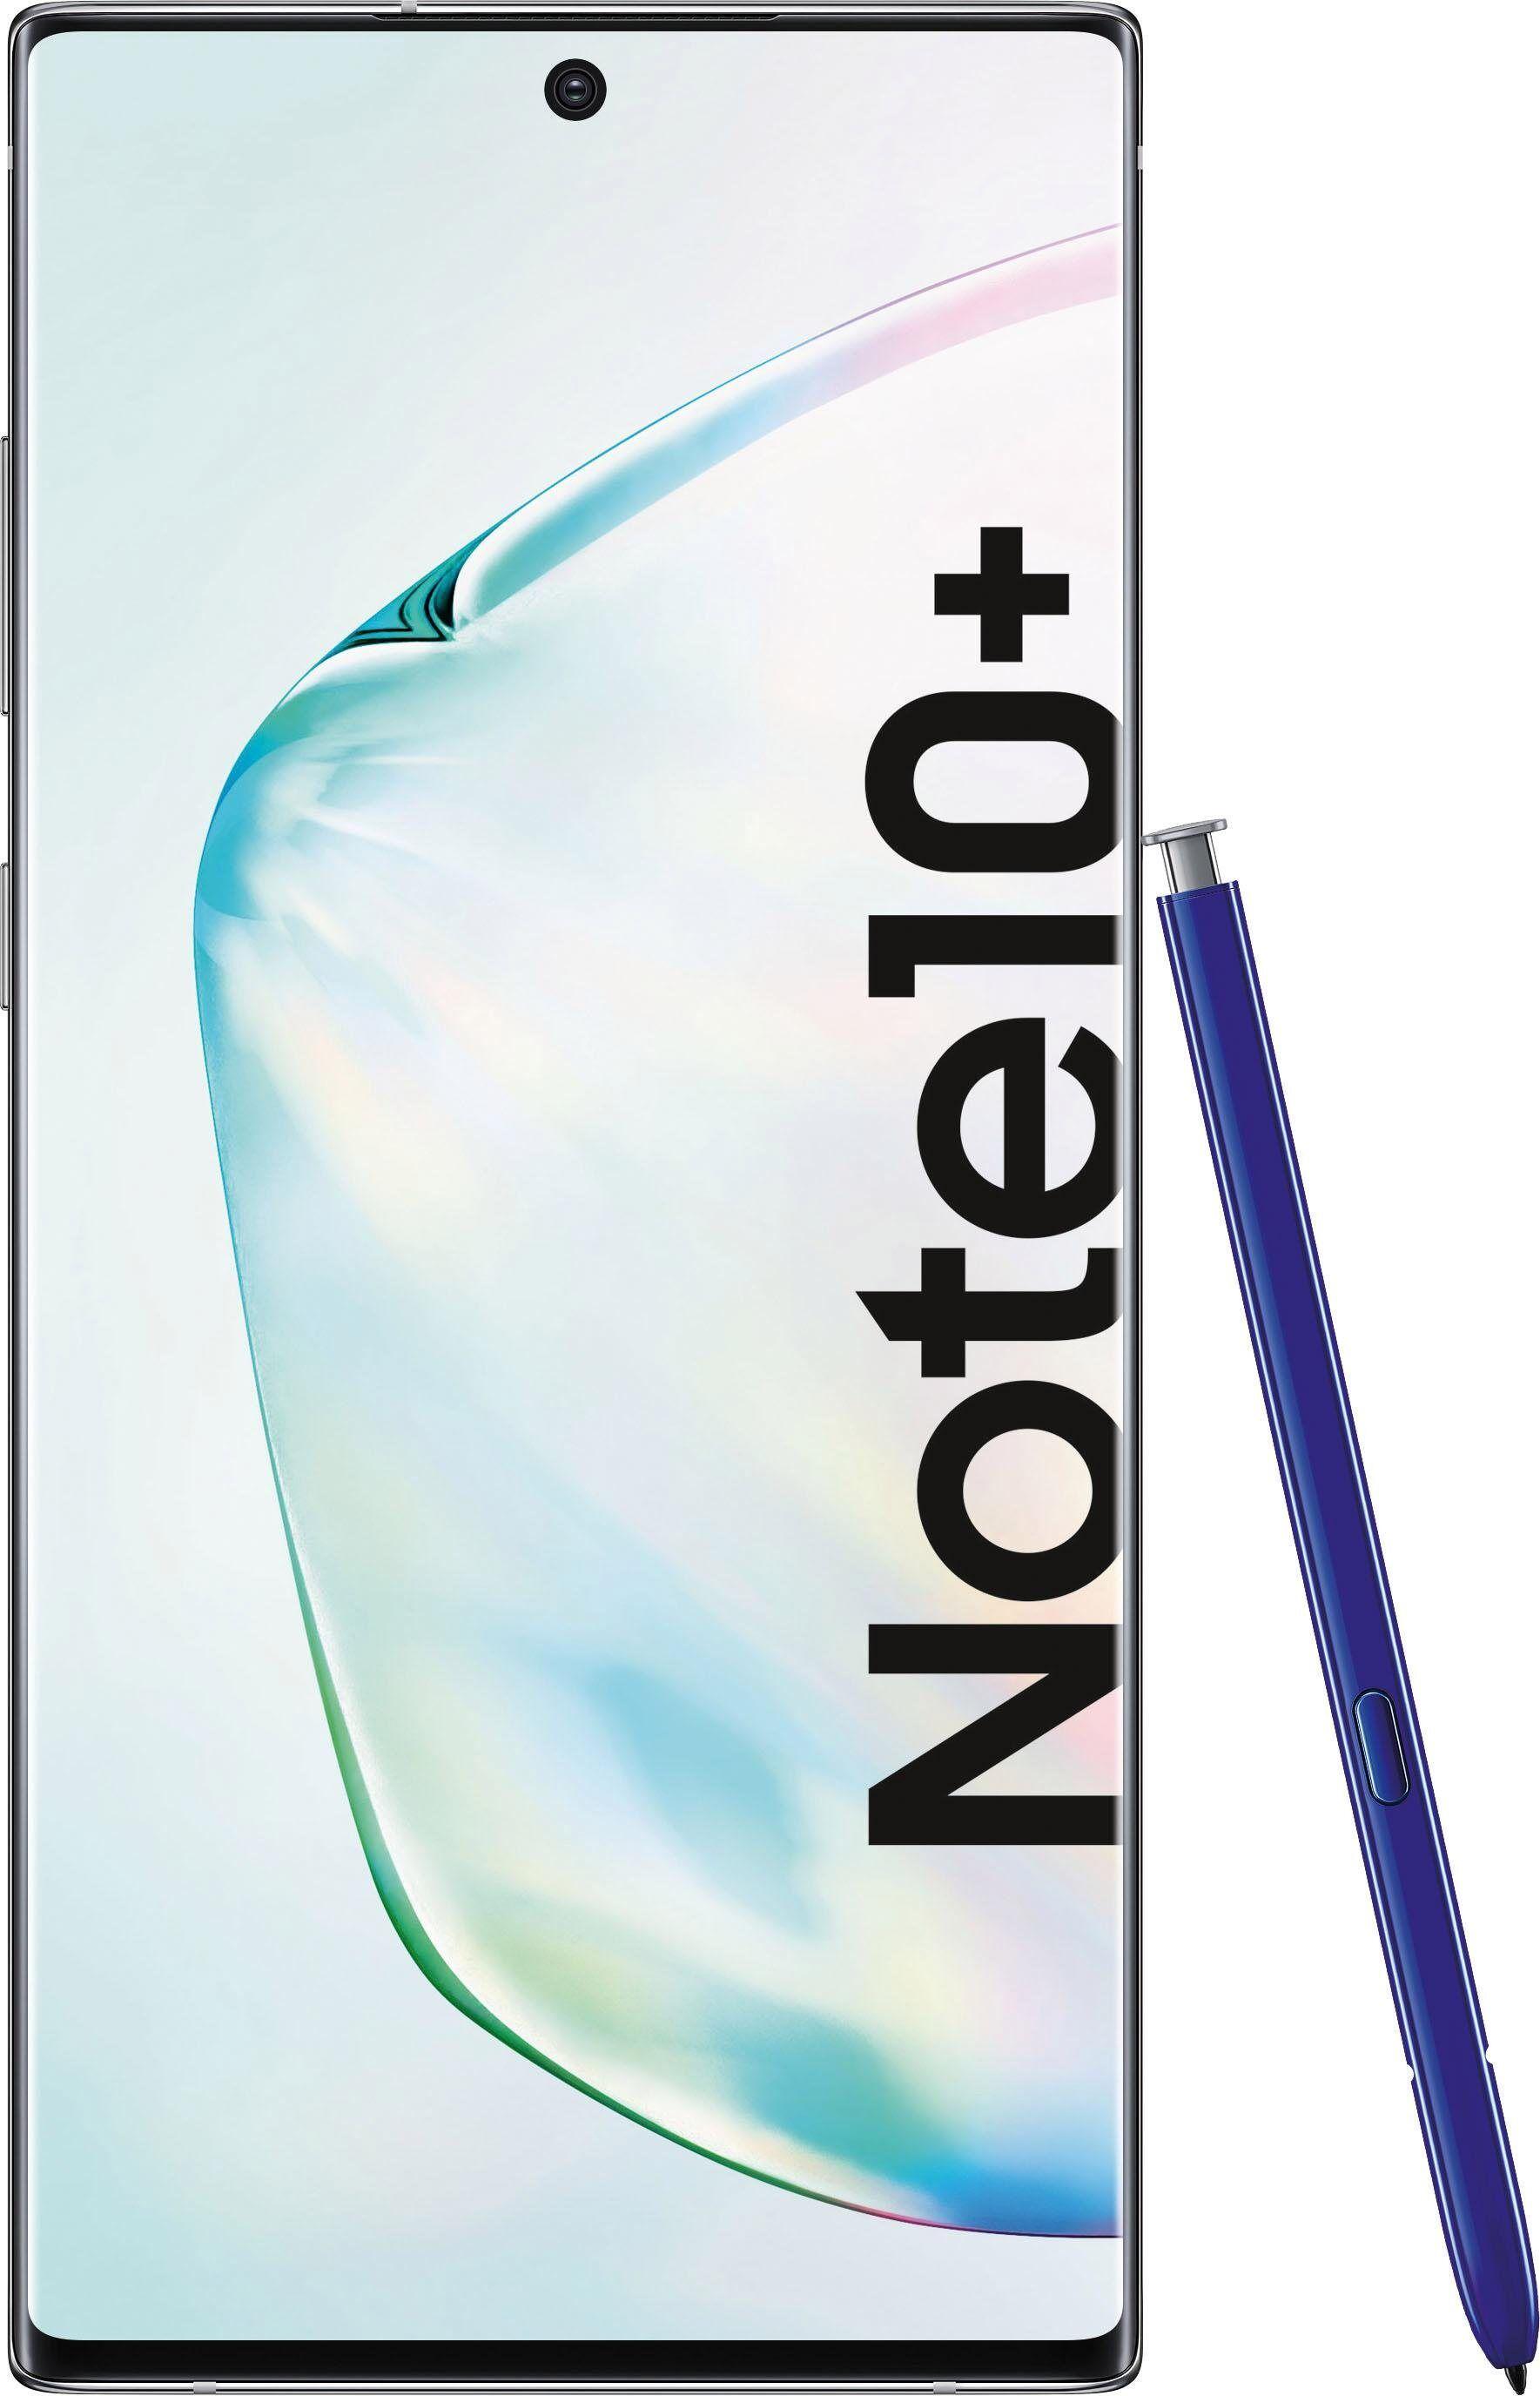 Samsung Galaxy Note10 Plus - 256 Smartphone (17,16 cm/6,8 Zoll, 256 GB Speicherplatz, 12 MP Kamera), aura glow